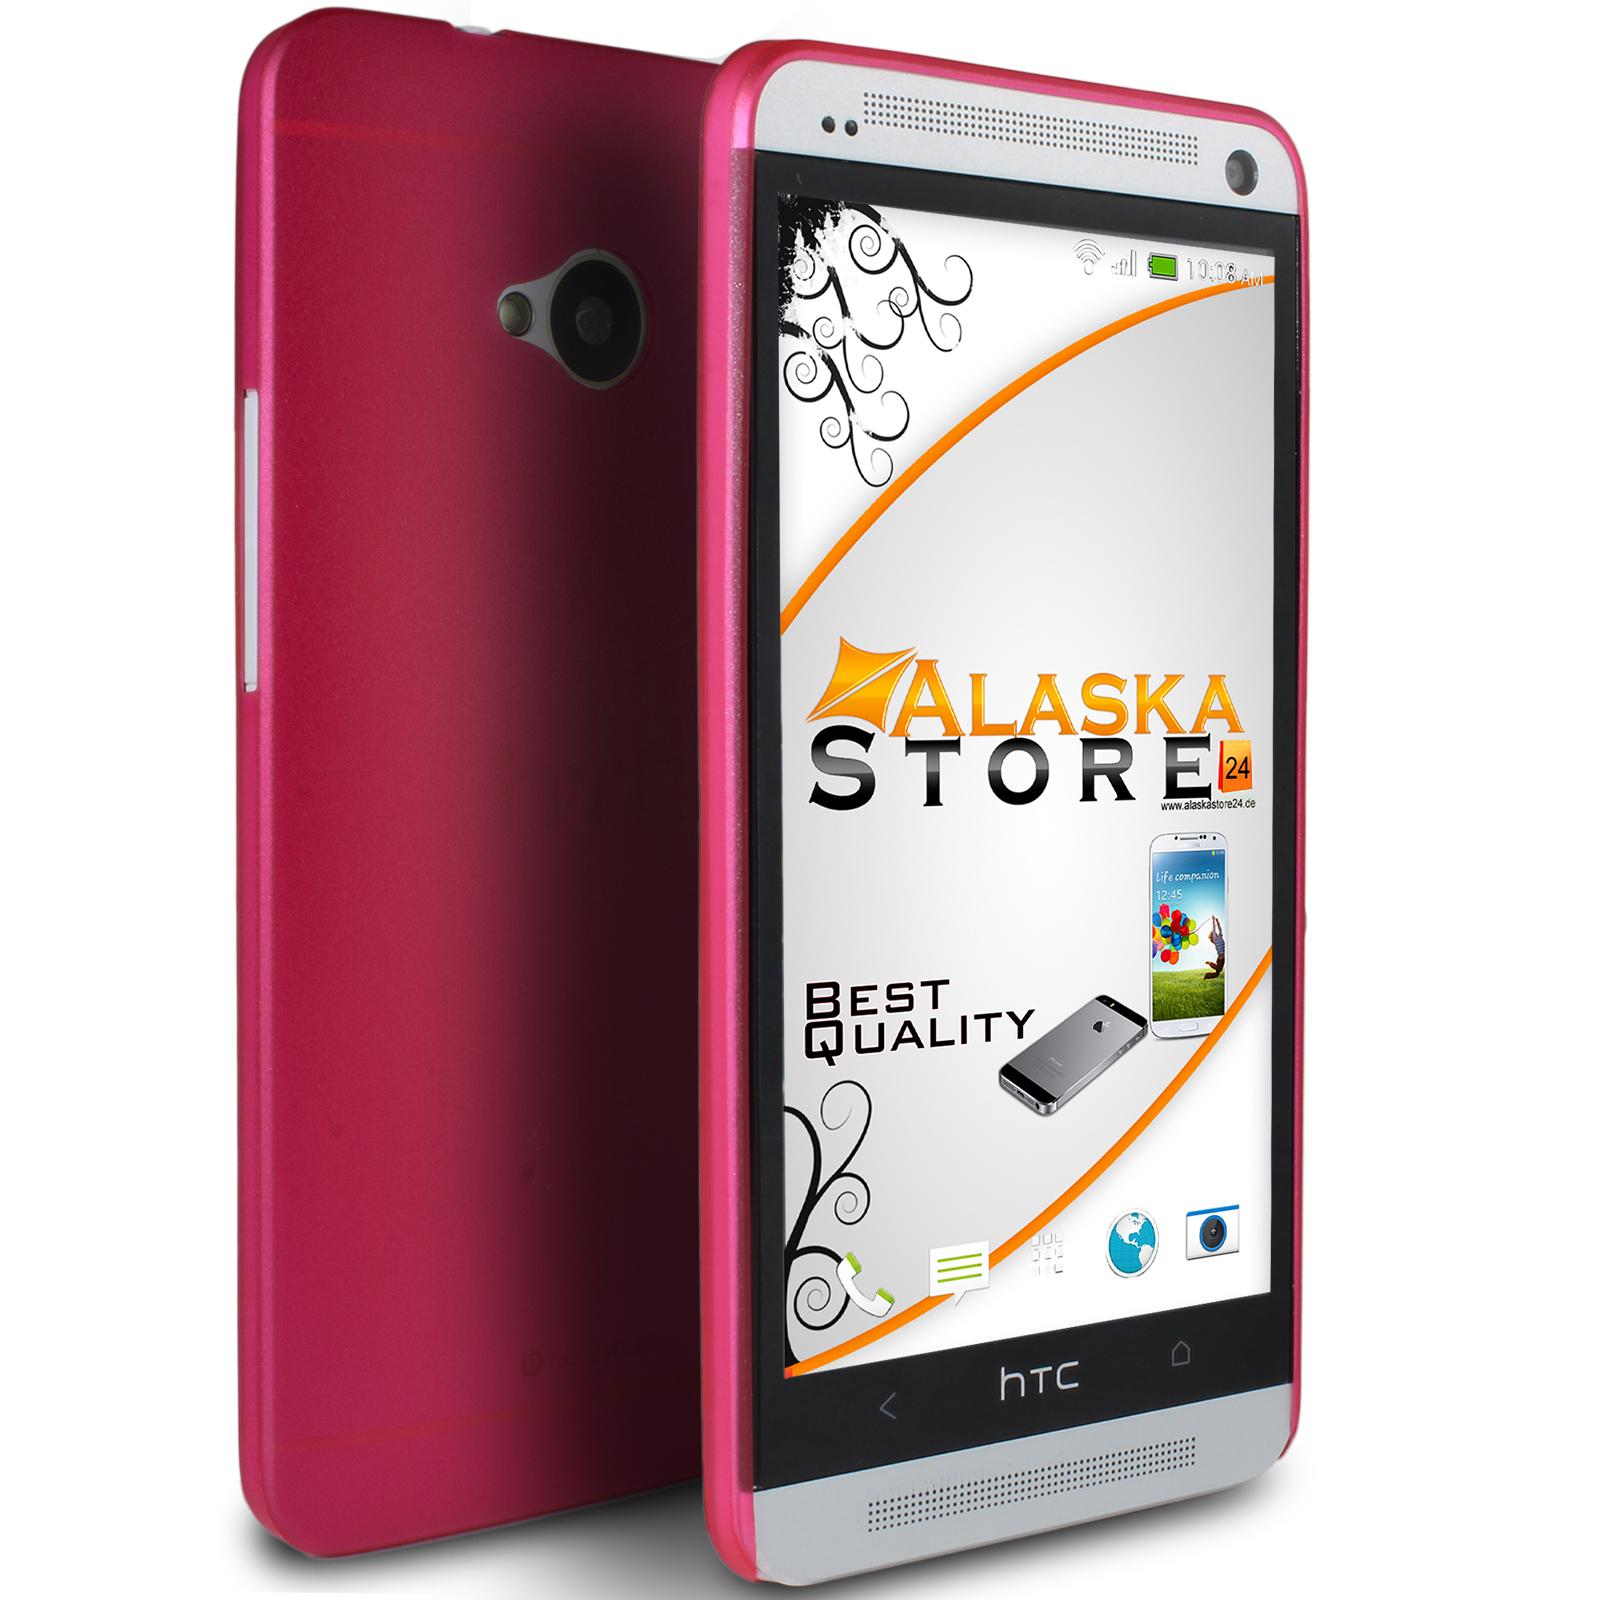 Hard-Gummi-Case-fuer-HTC-One-Serie-Bumper-Slim-Prima-Rueckschale-Bag-Farbauswahl